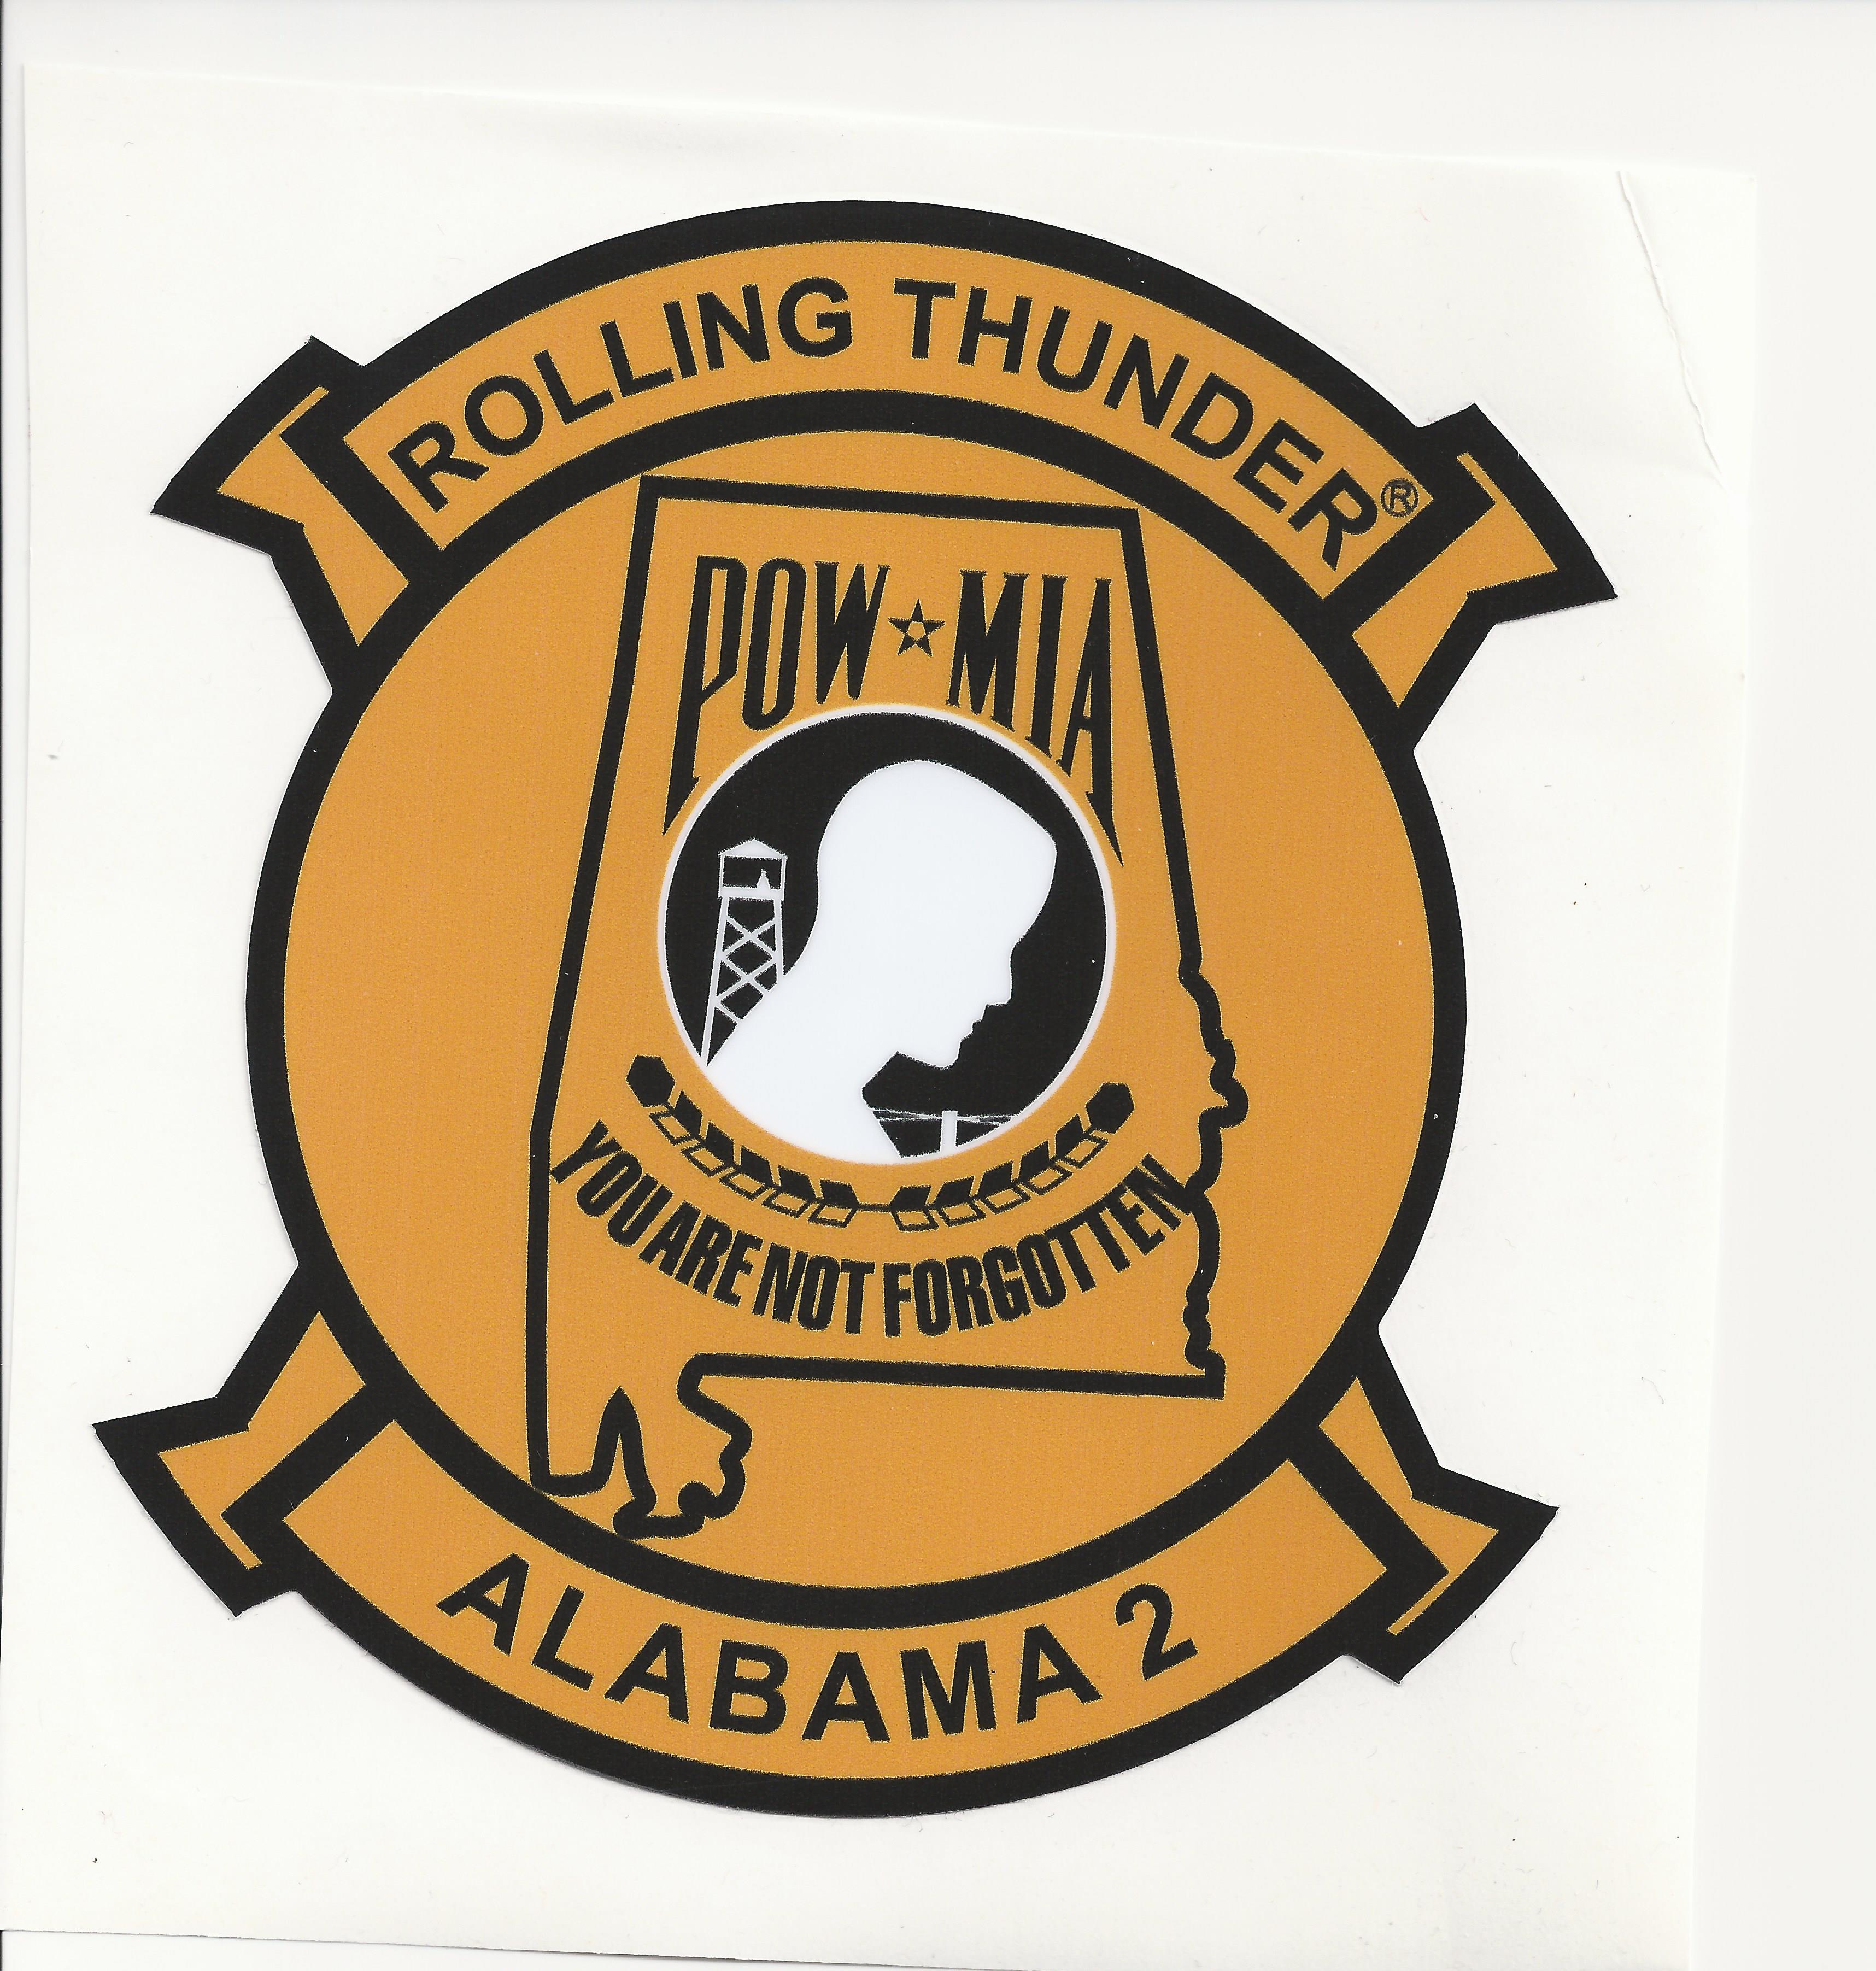 Z. Rolling Thunder AL2b (1)